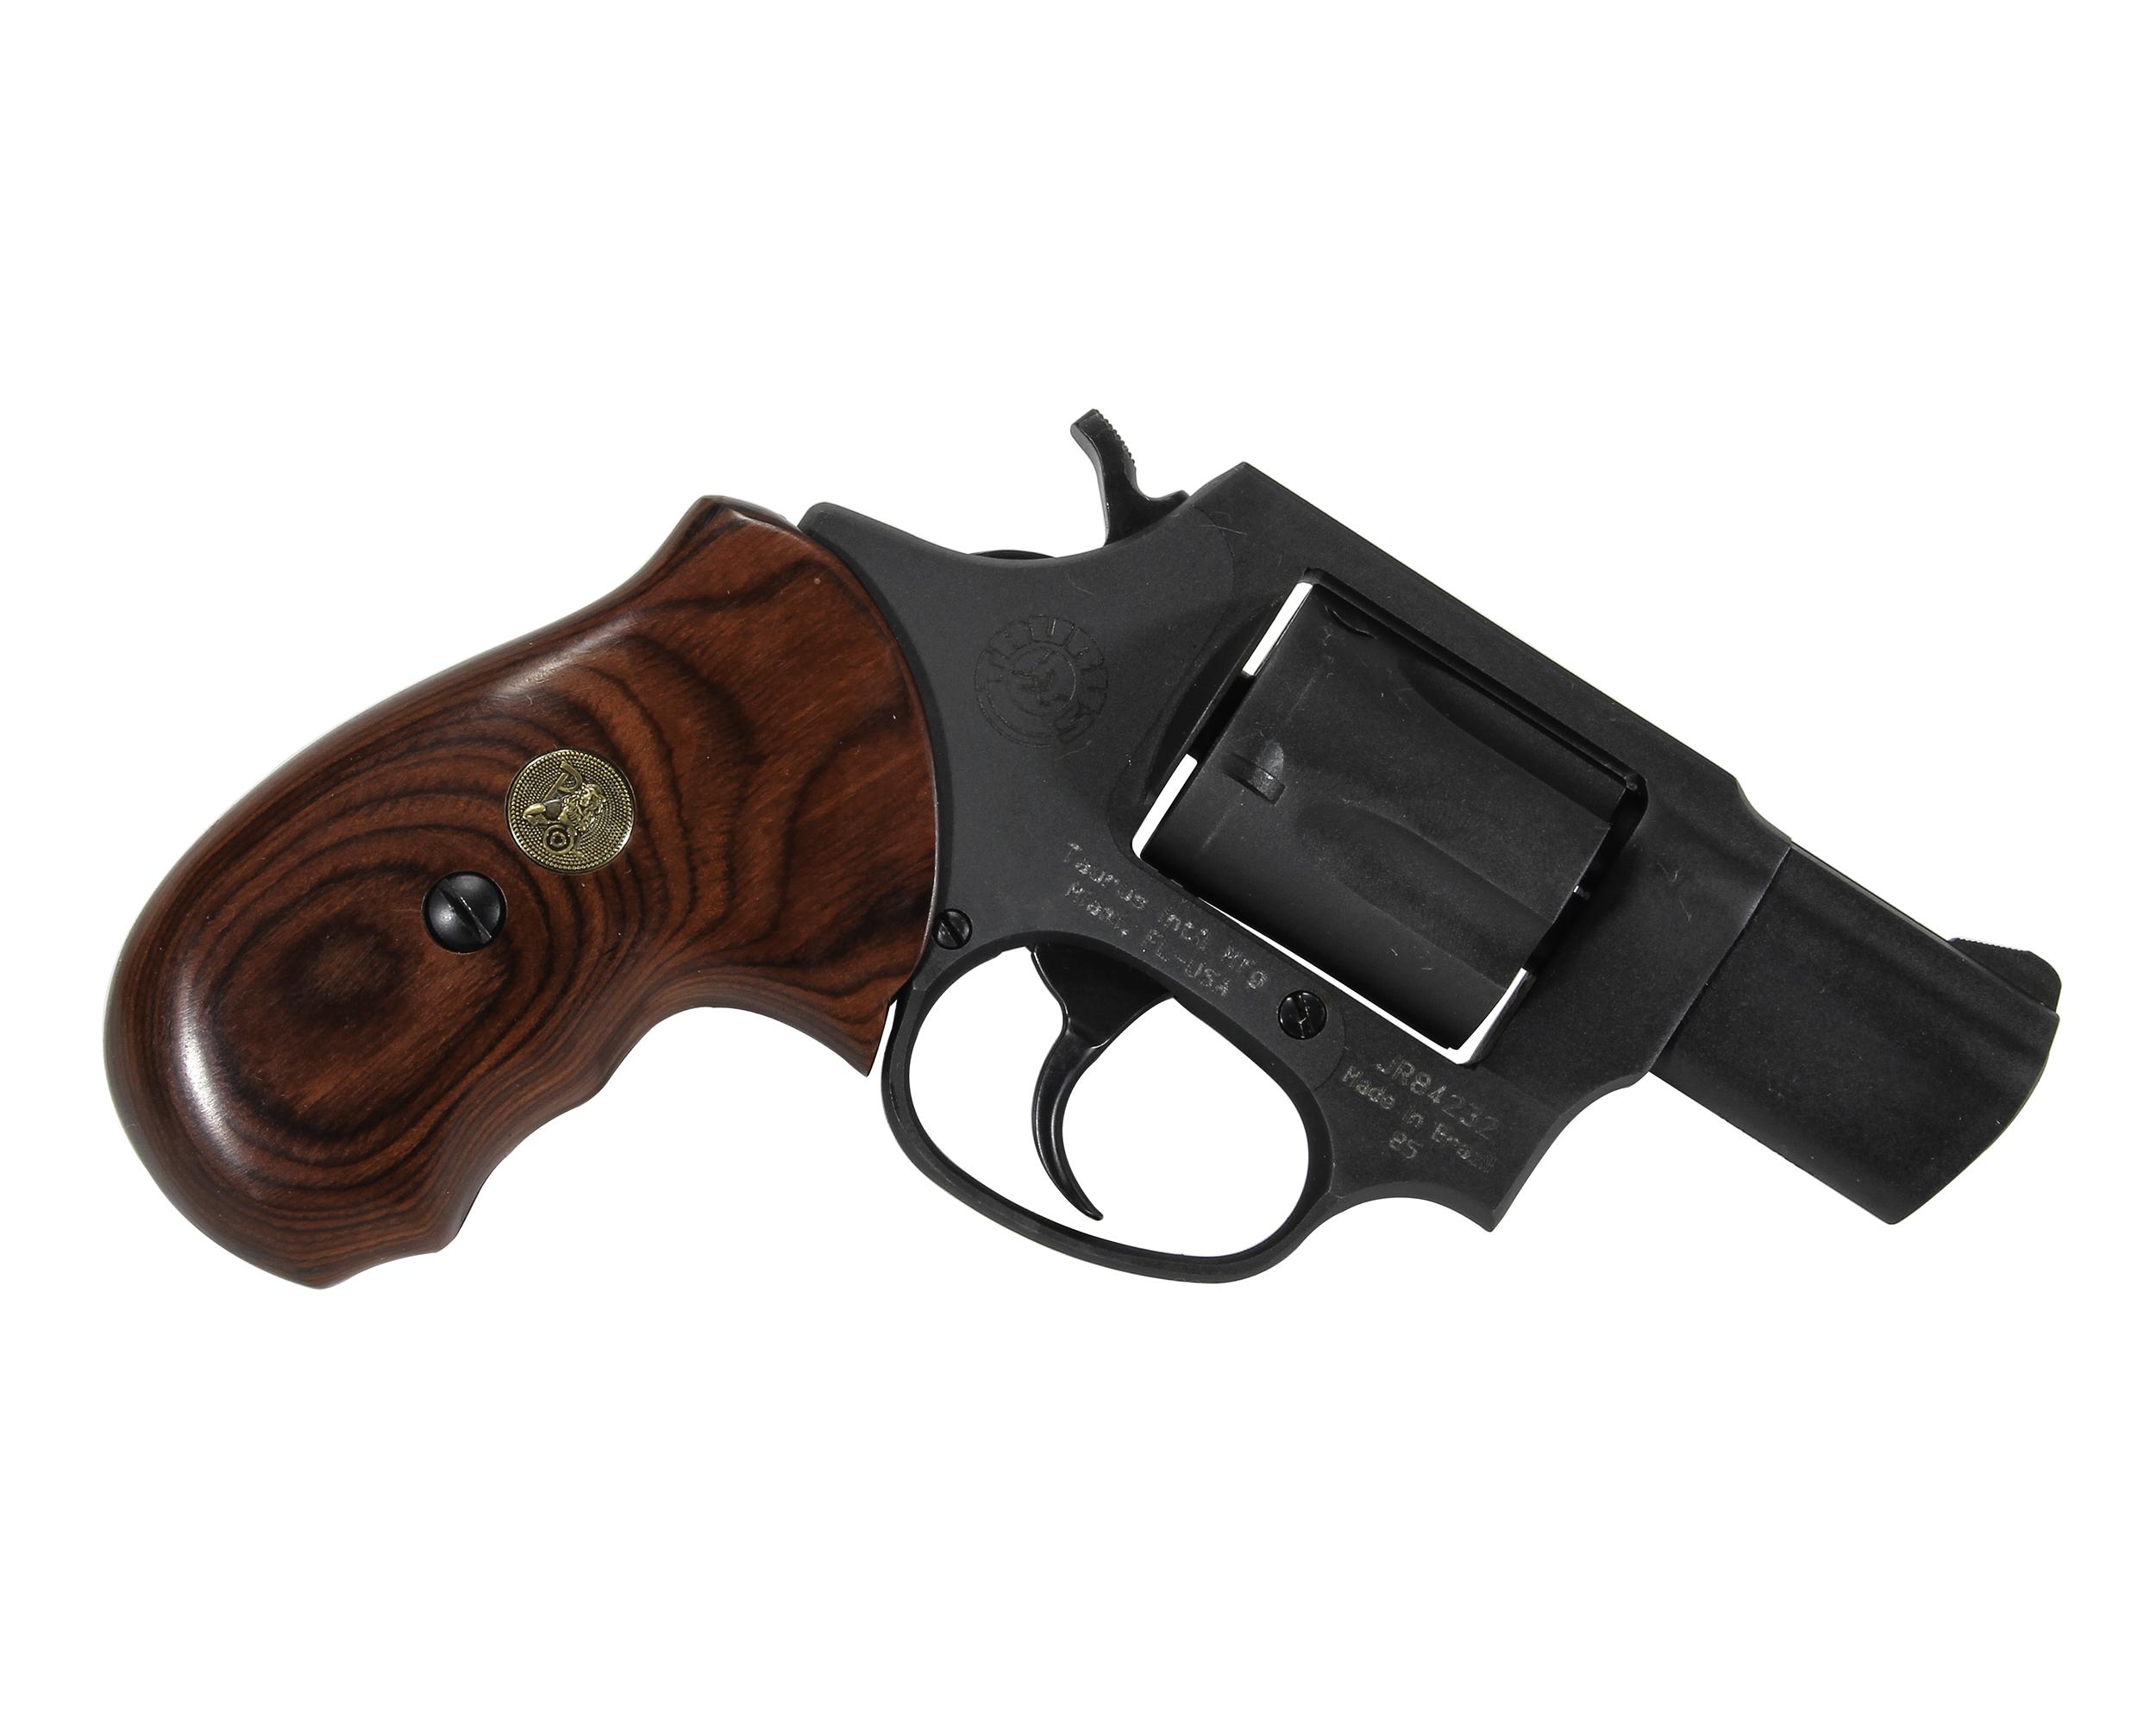 Pachmayr Taurus Firearm Grip